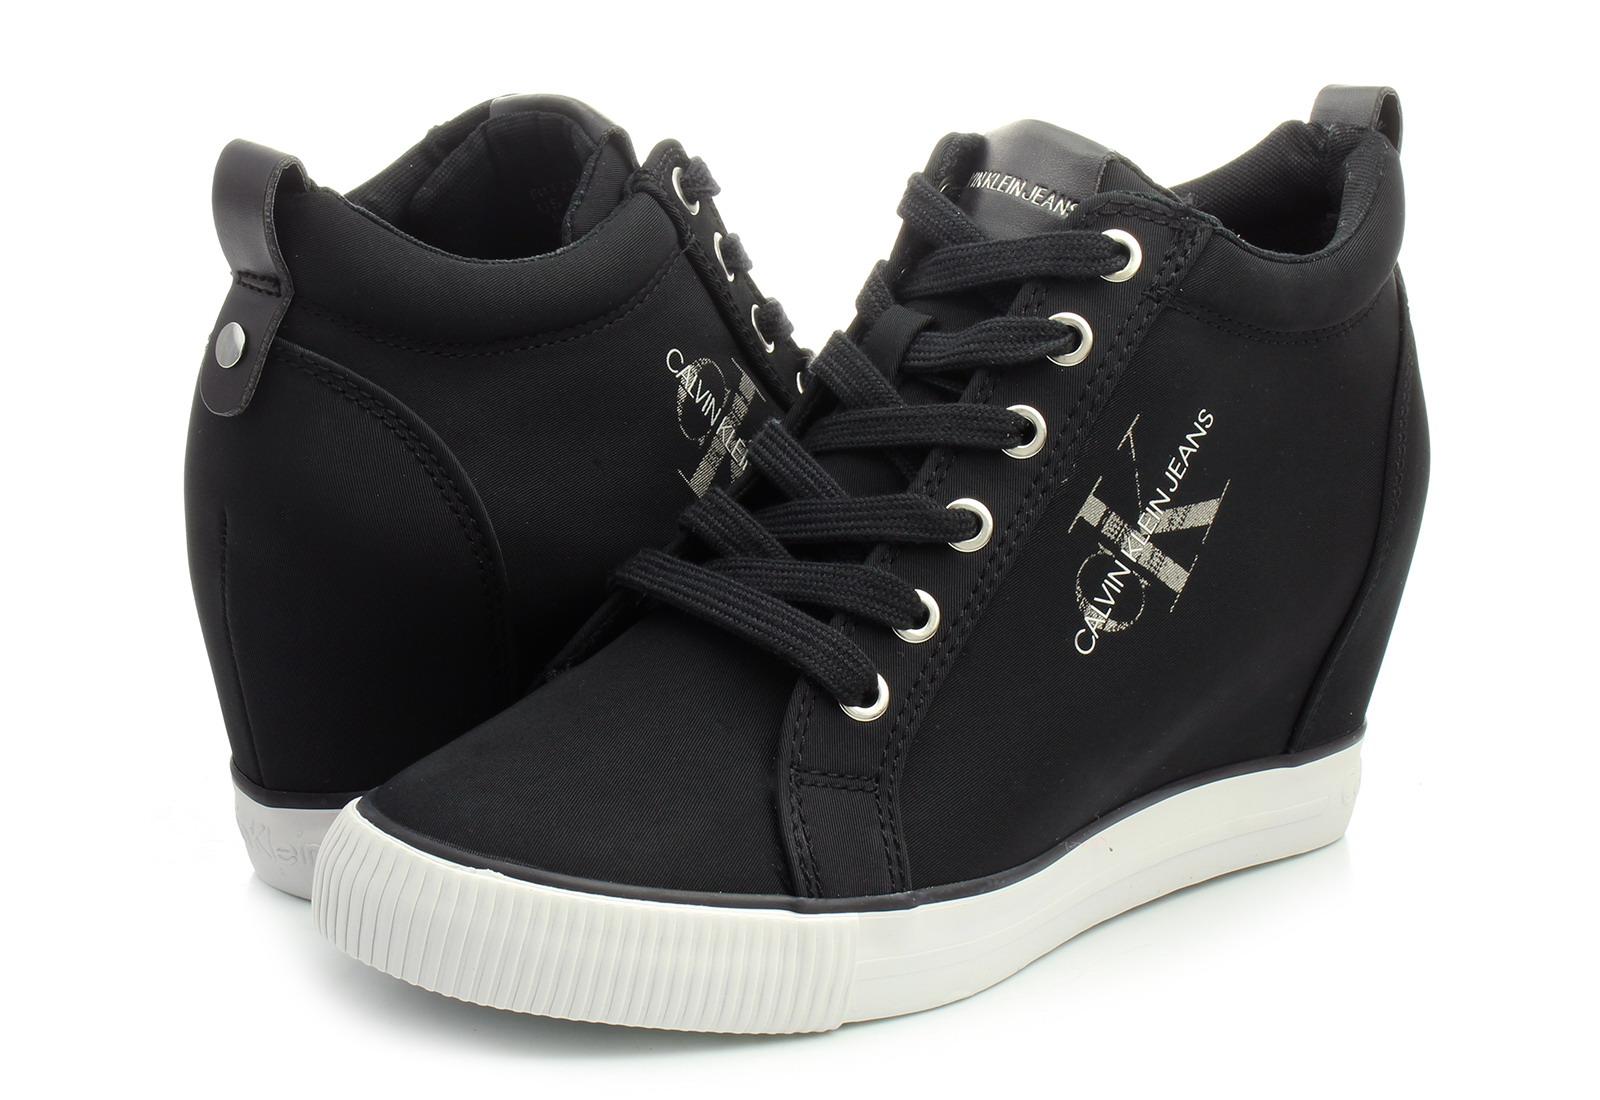 e192249fe2 Calvin Klein Jeans Cipő - Ritzy - RE9800-BLK - Office Shoes Magyarország